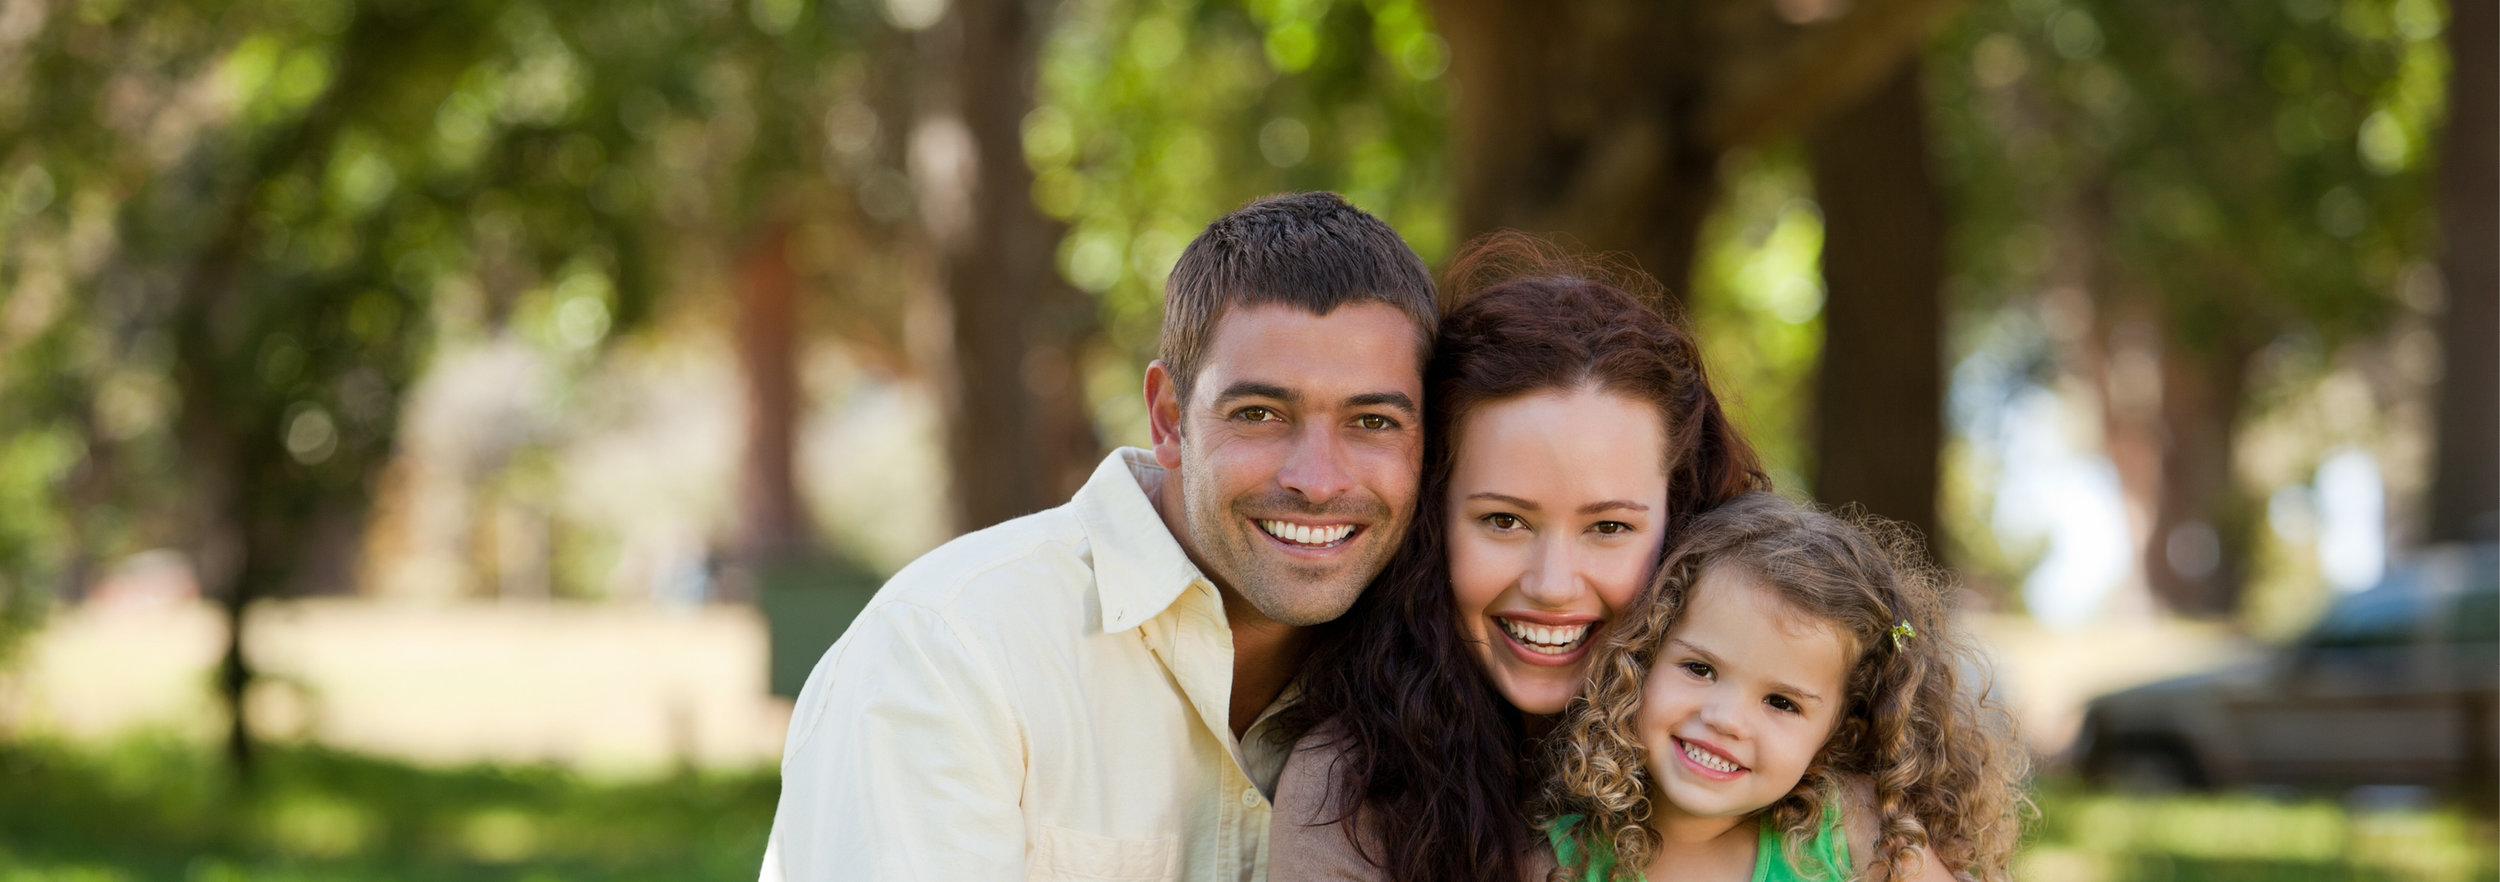 Dental Implants, Stunning Smiles